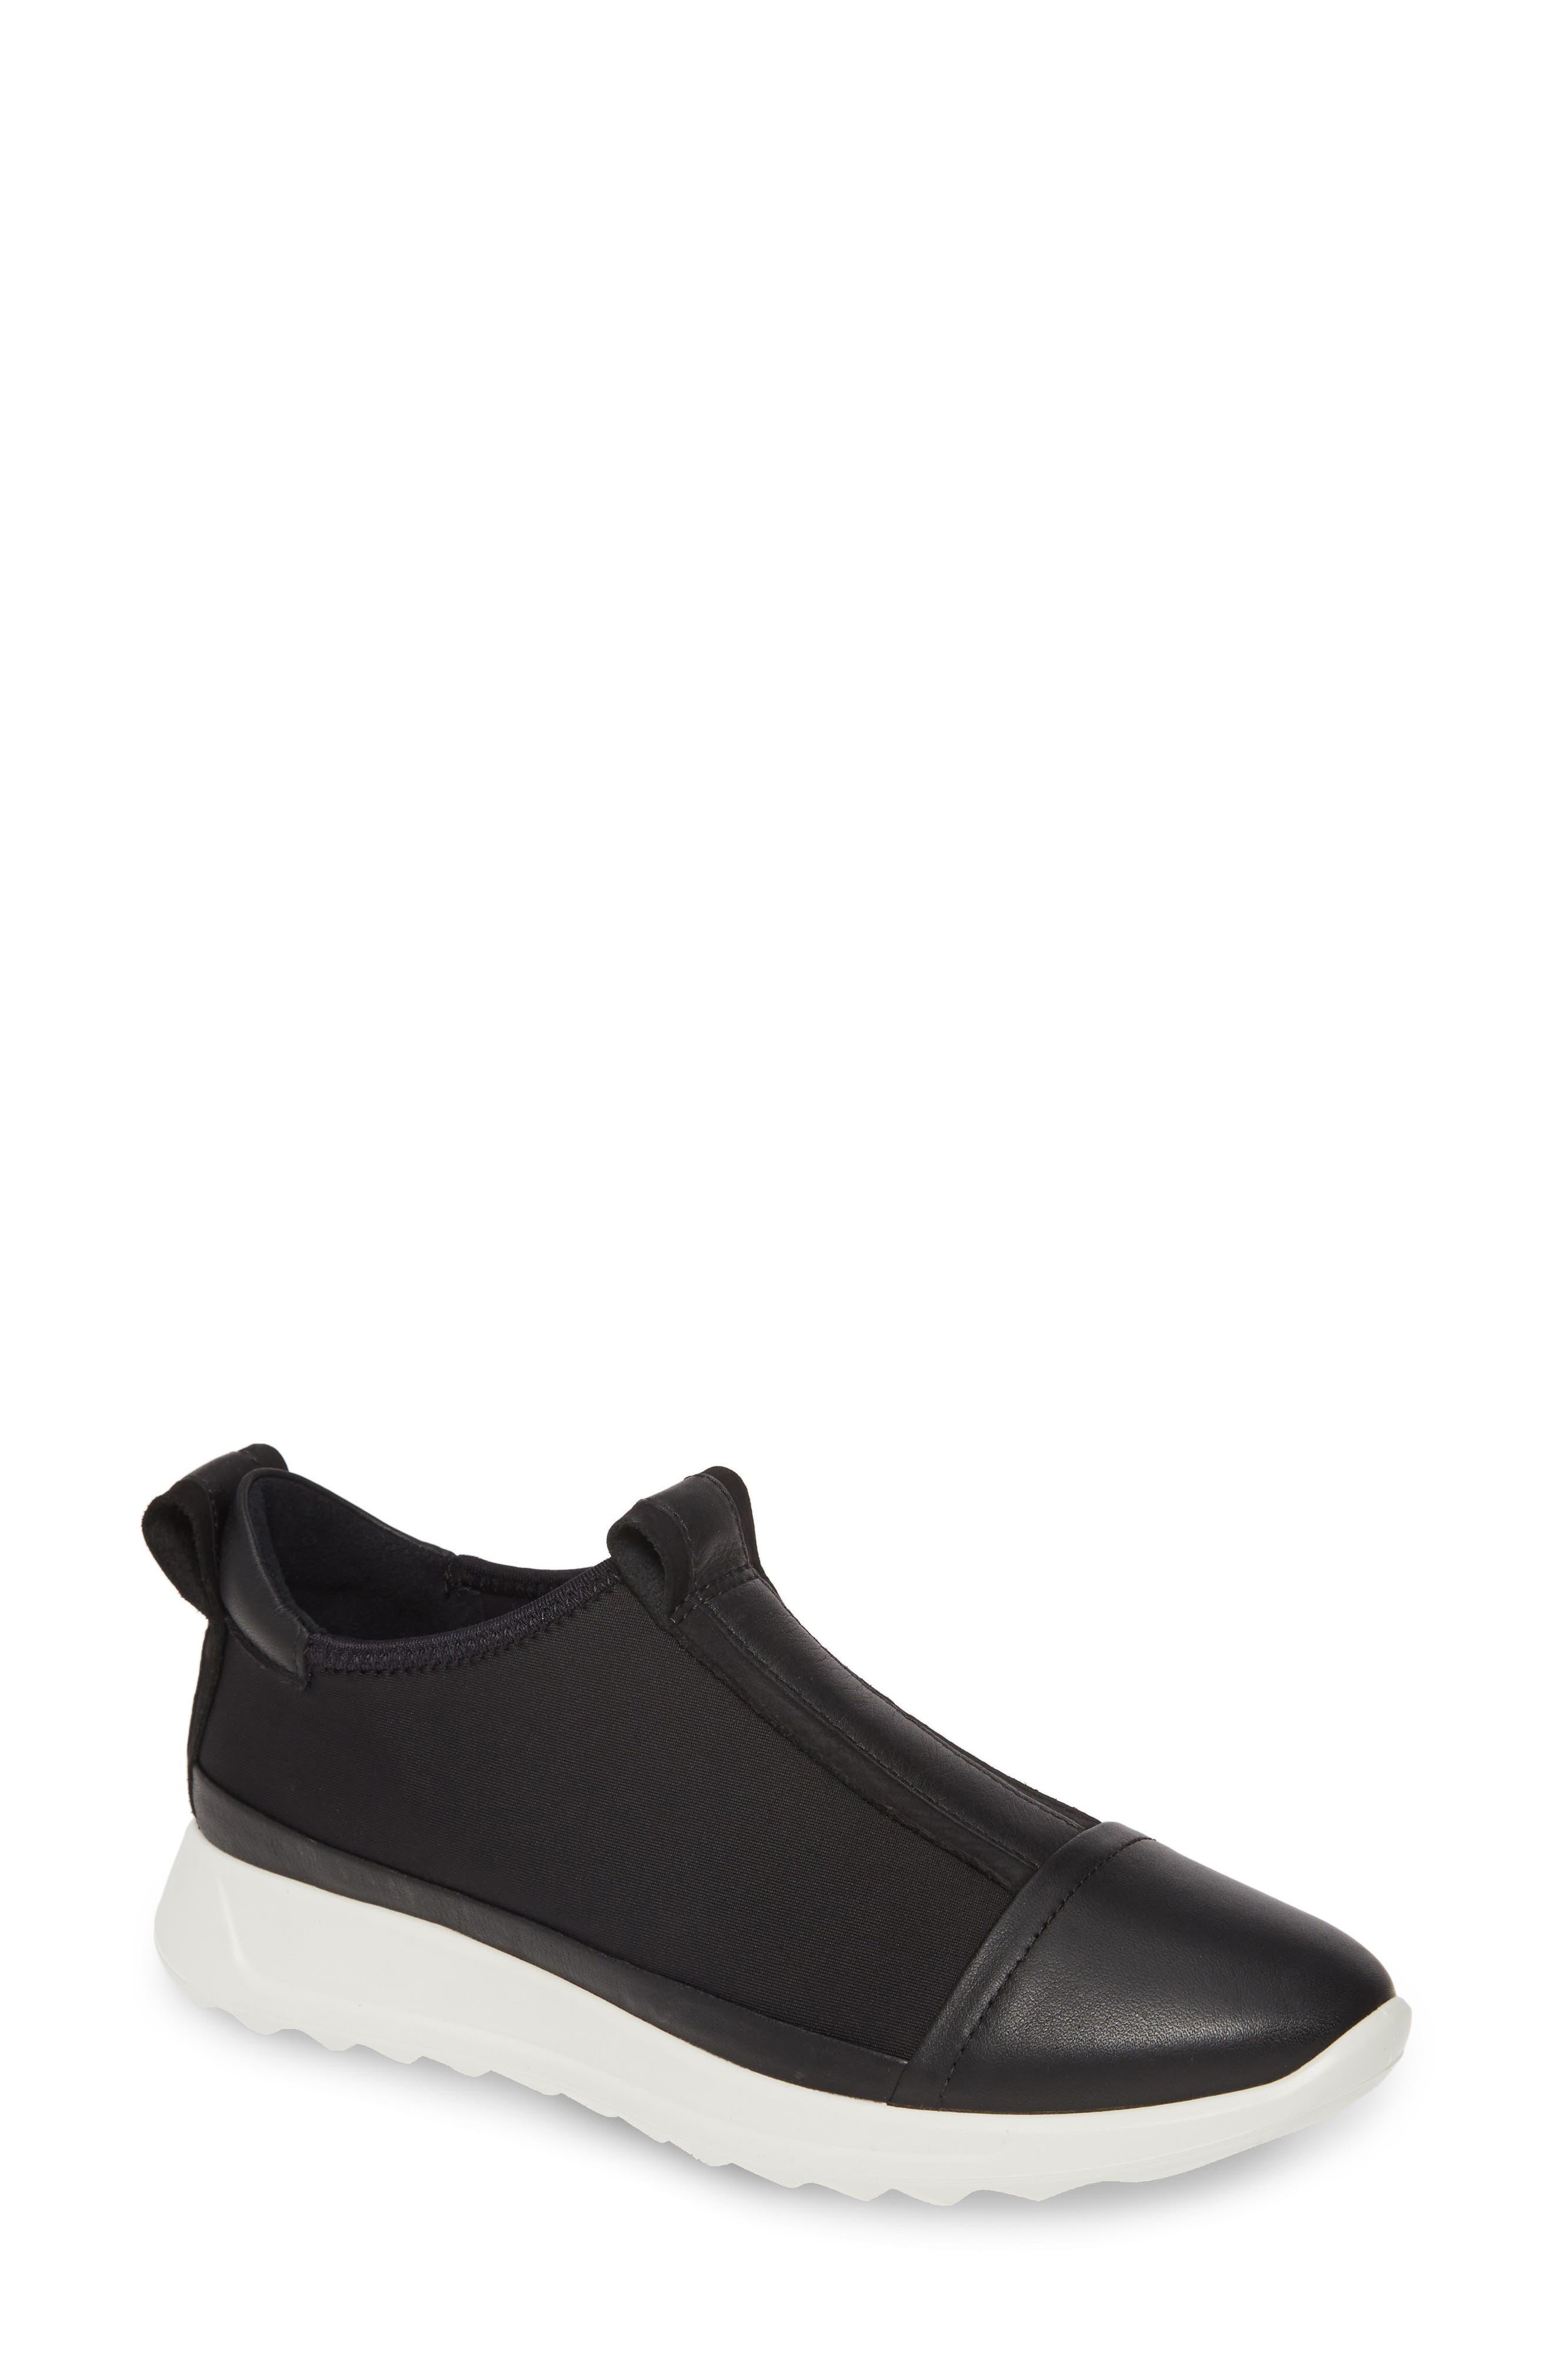 Ecco Flexure Running Shoe, Black